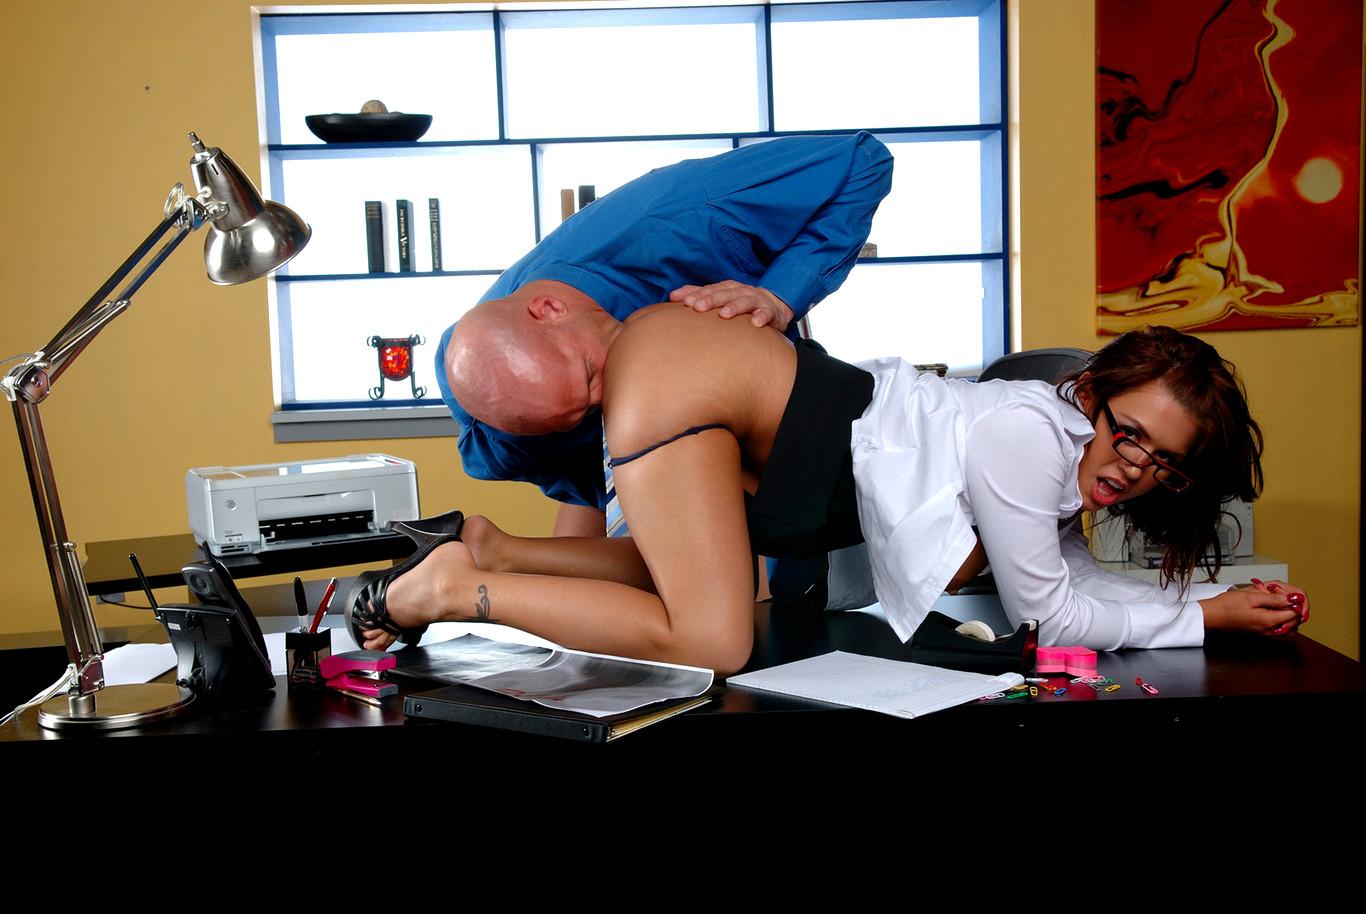 Office Sex Confessions In Australia